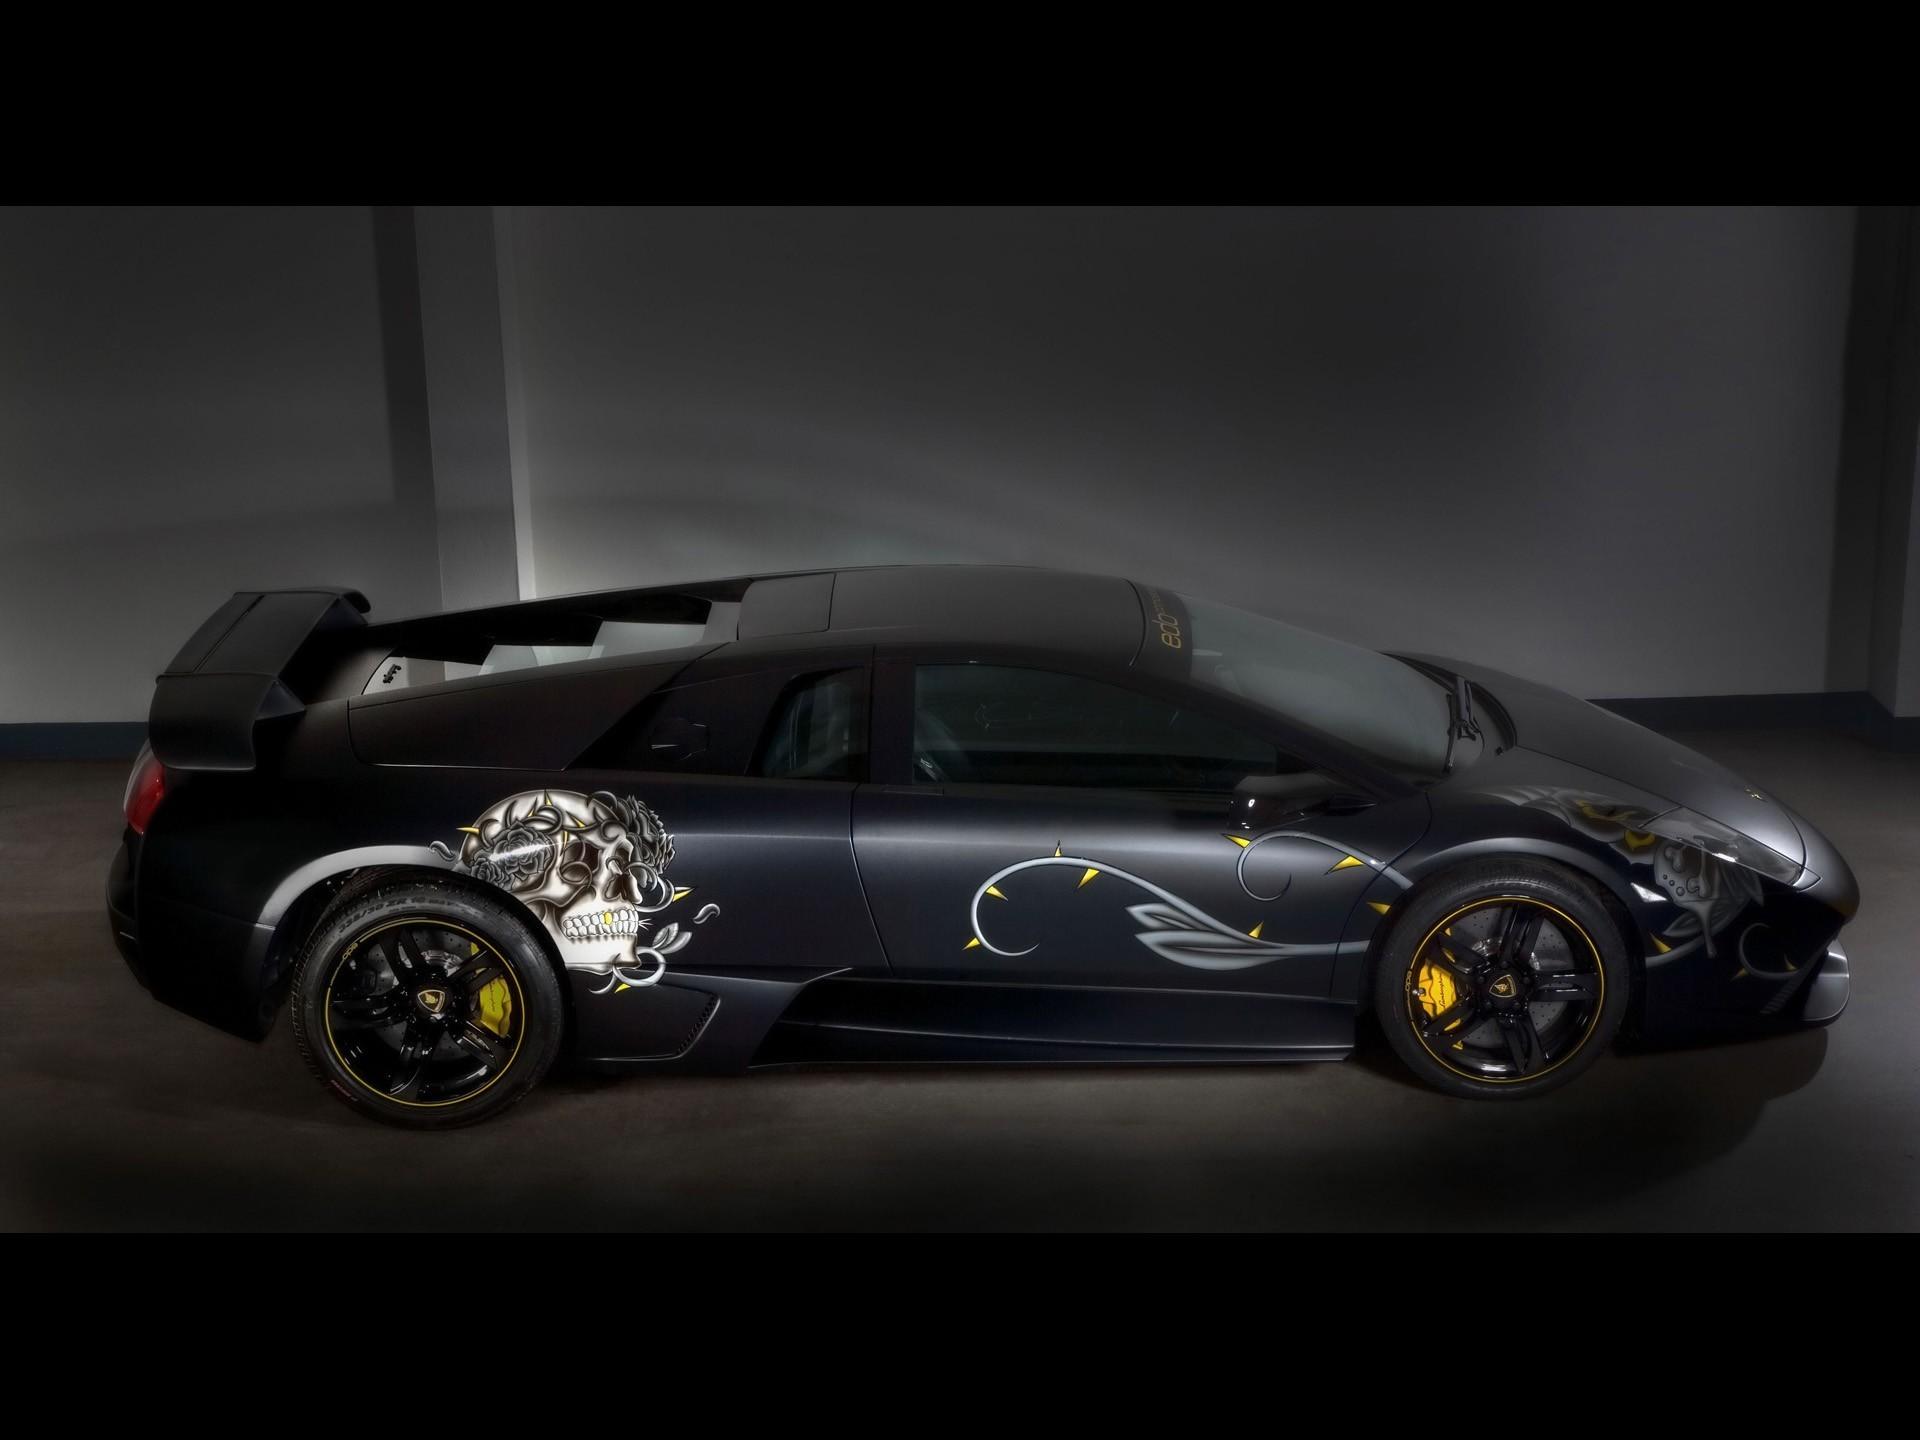 Res: 1920x1440, Black Lamborghini Wallpaper 34 Desktop Wallpaper